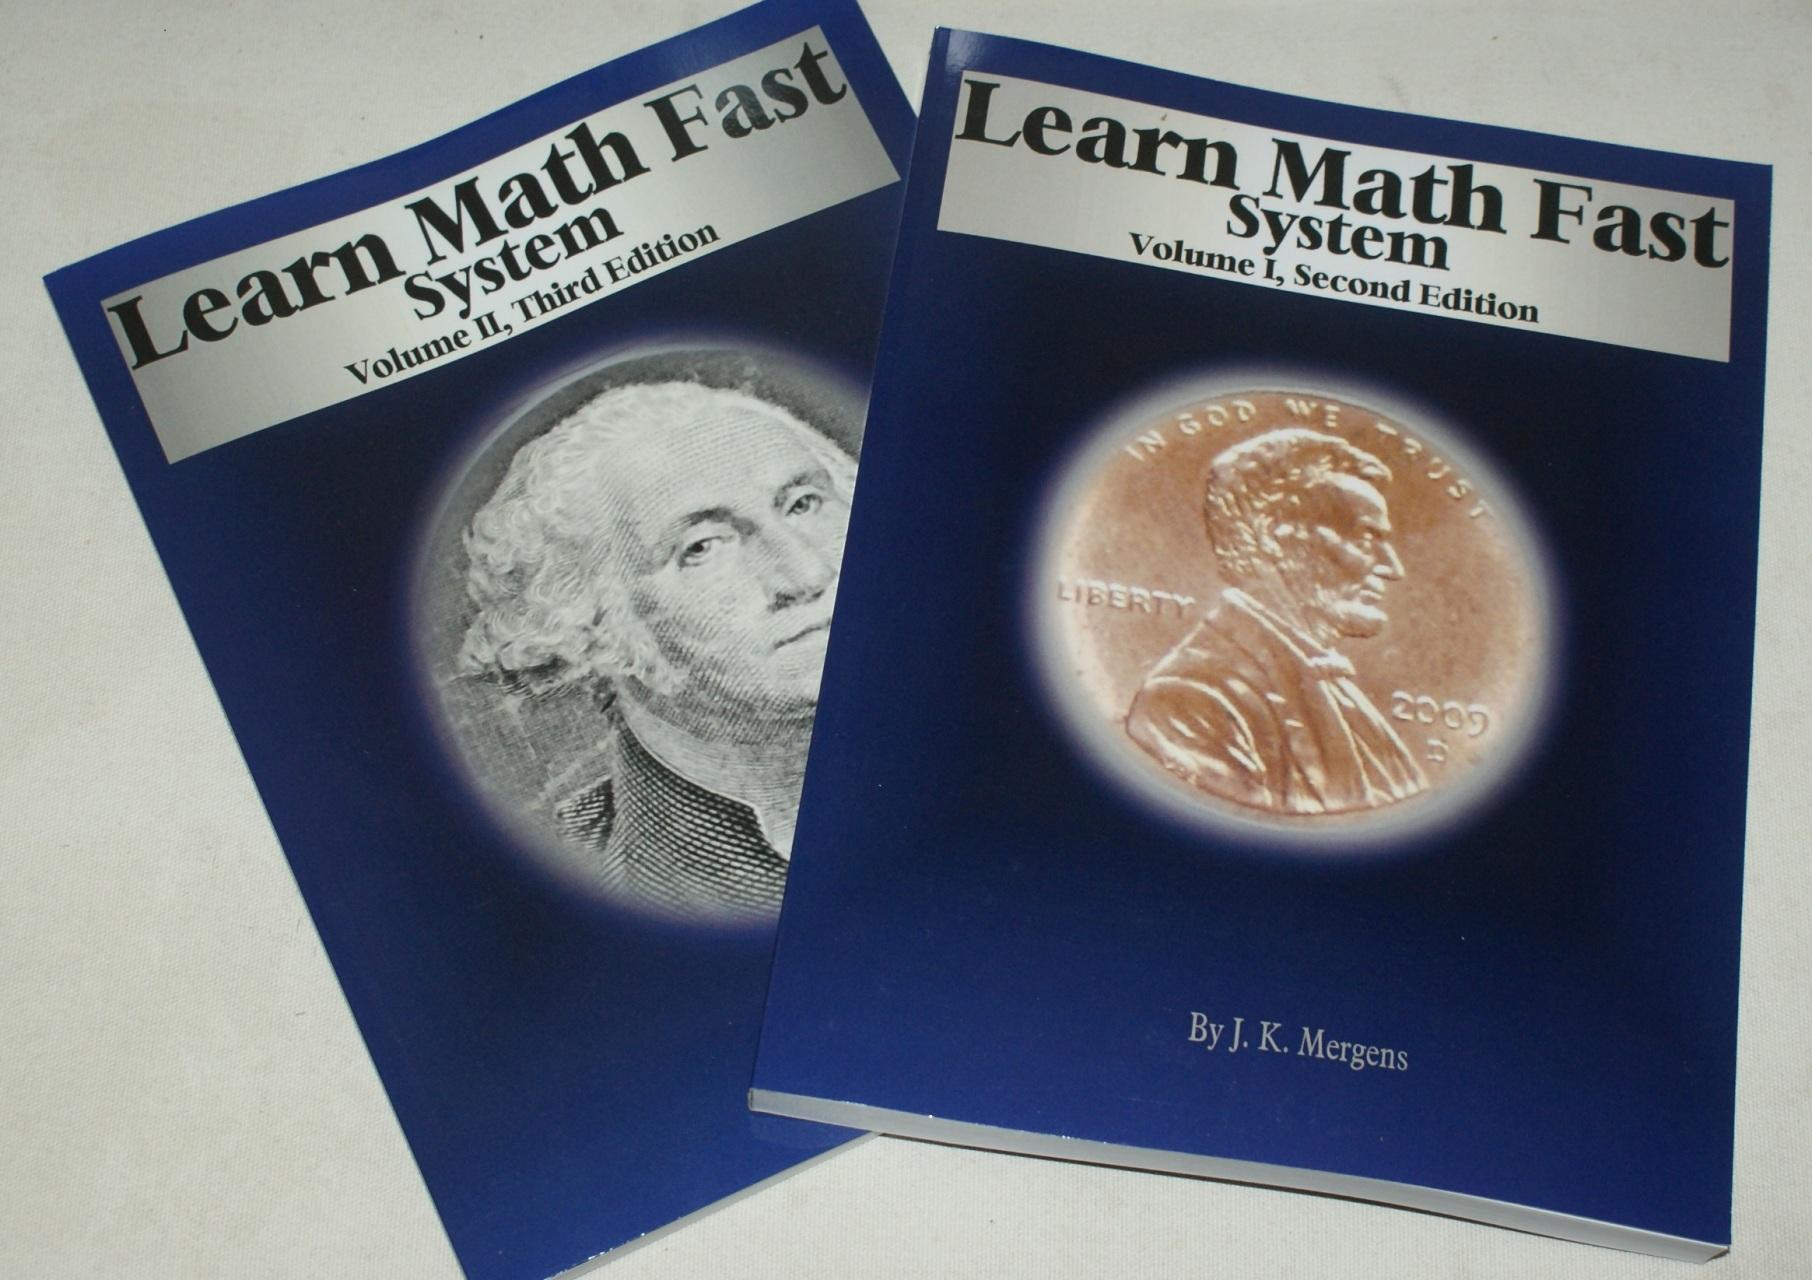 Buy Learn Math Fast Books Learn Math Fast System